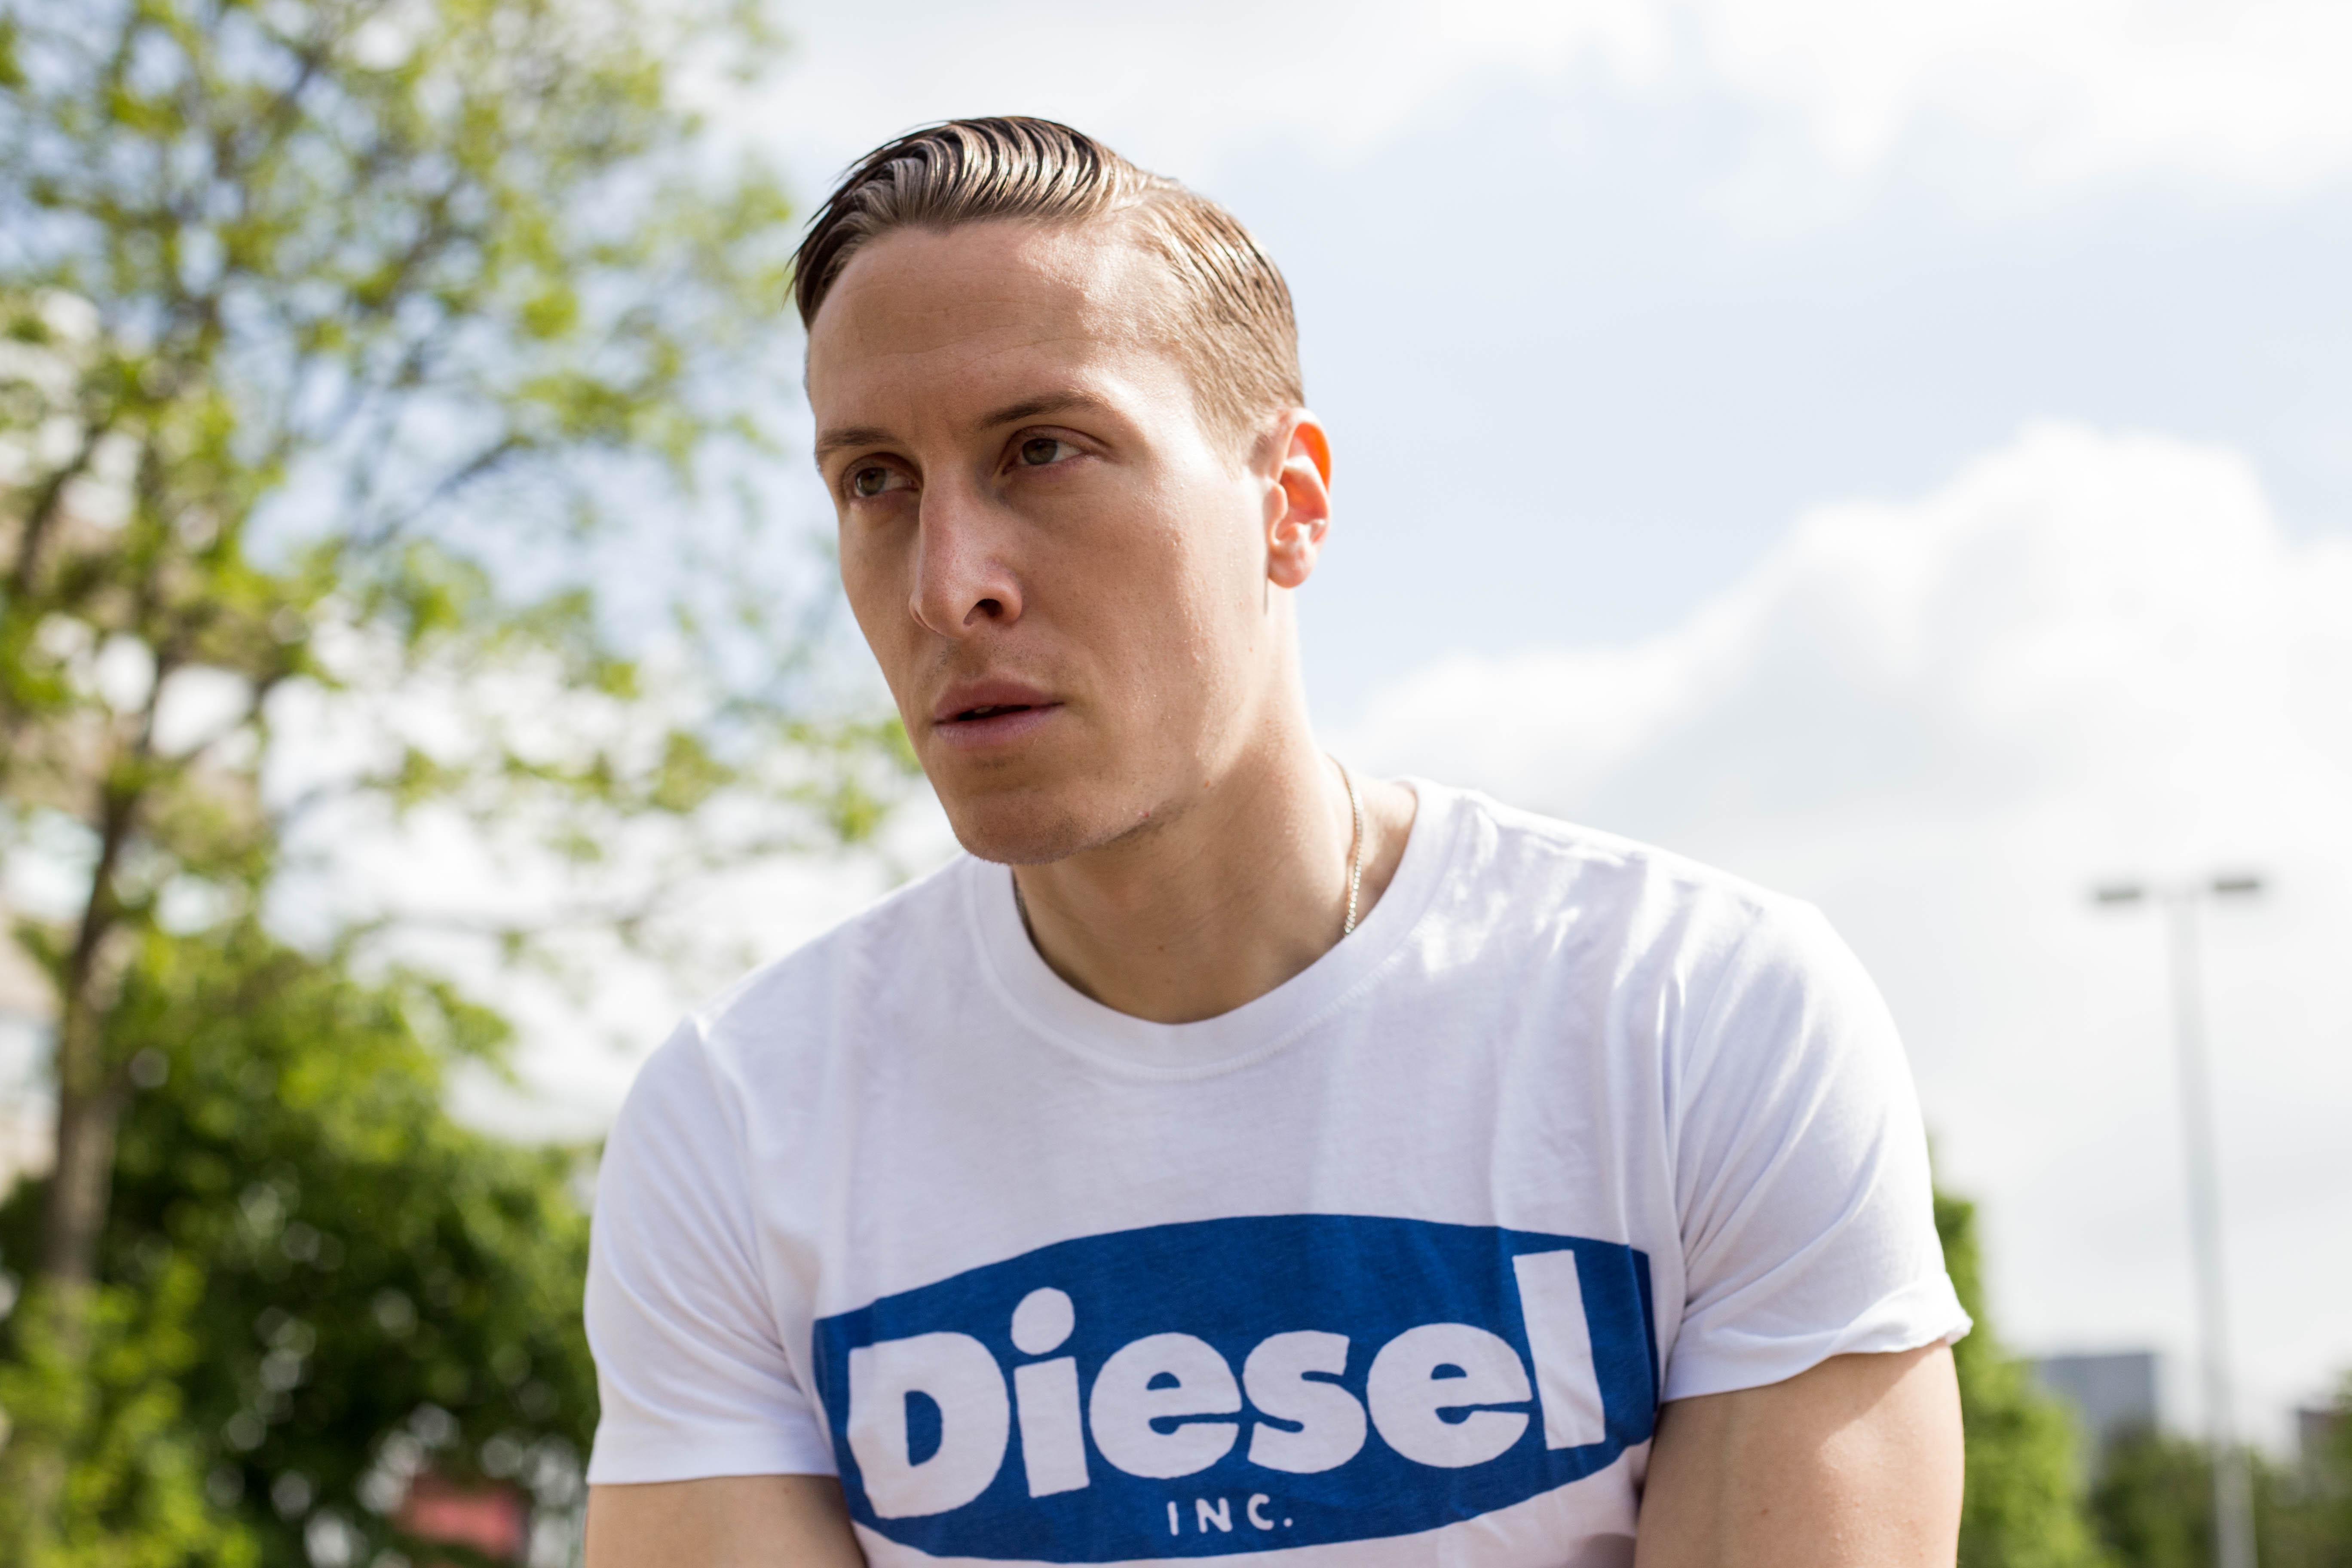 diesel-shirt-fashionlook-menfashion-männerblog-berlin-outfit_6654